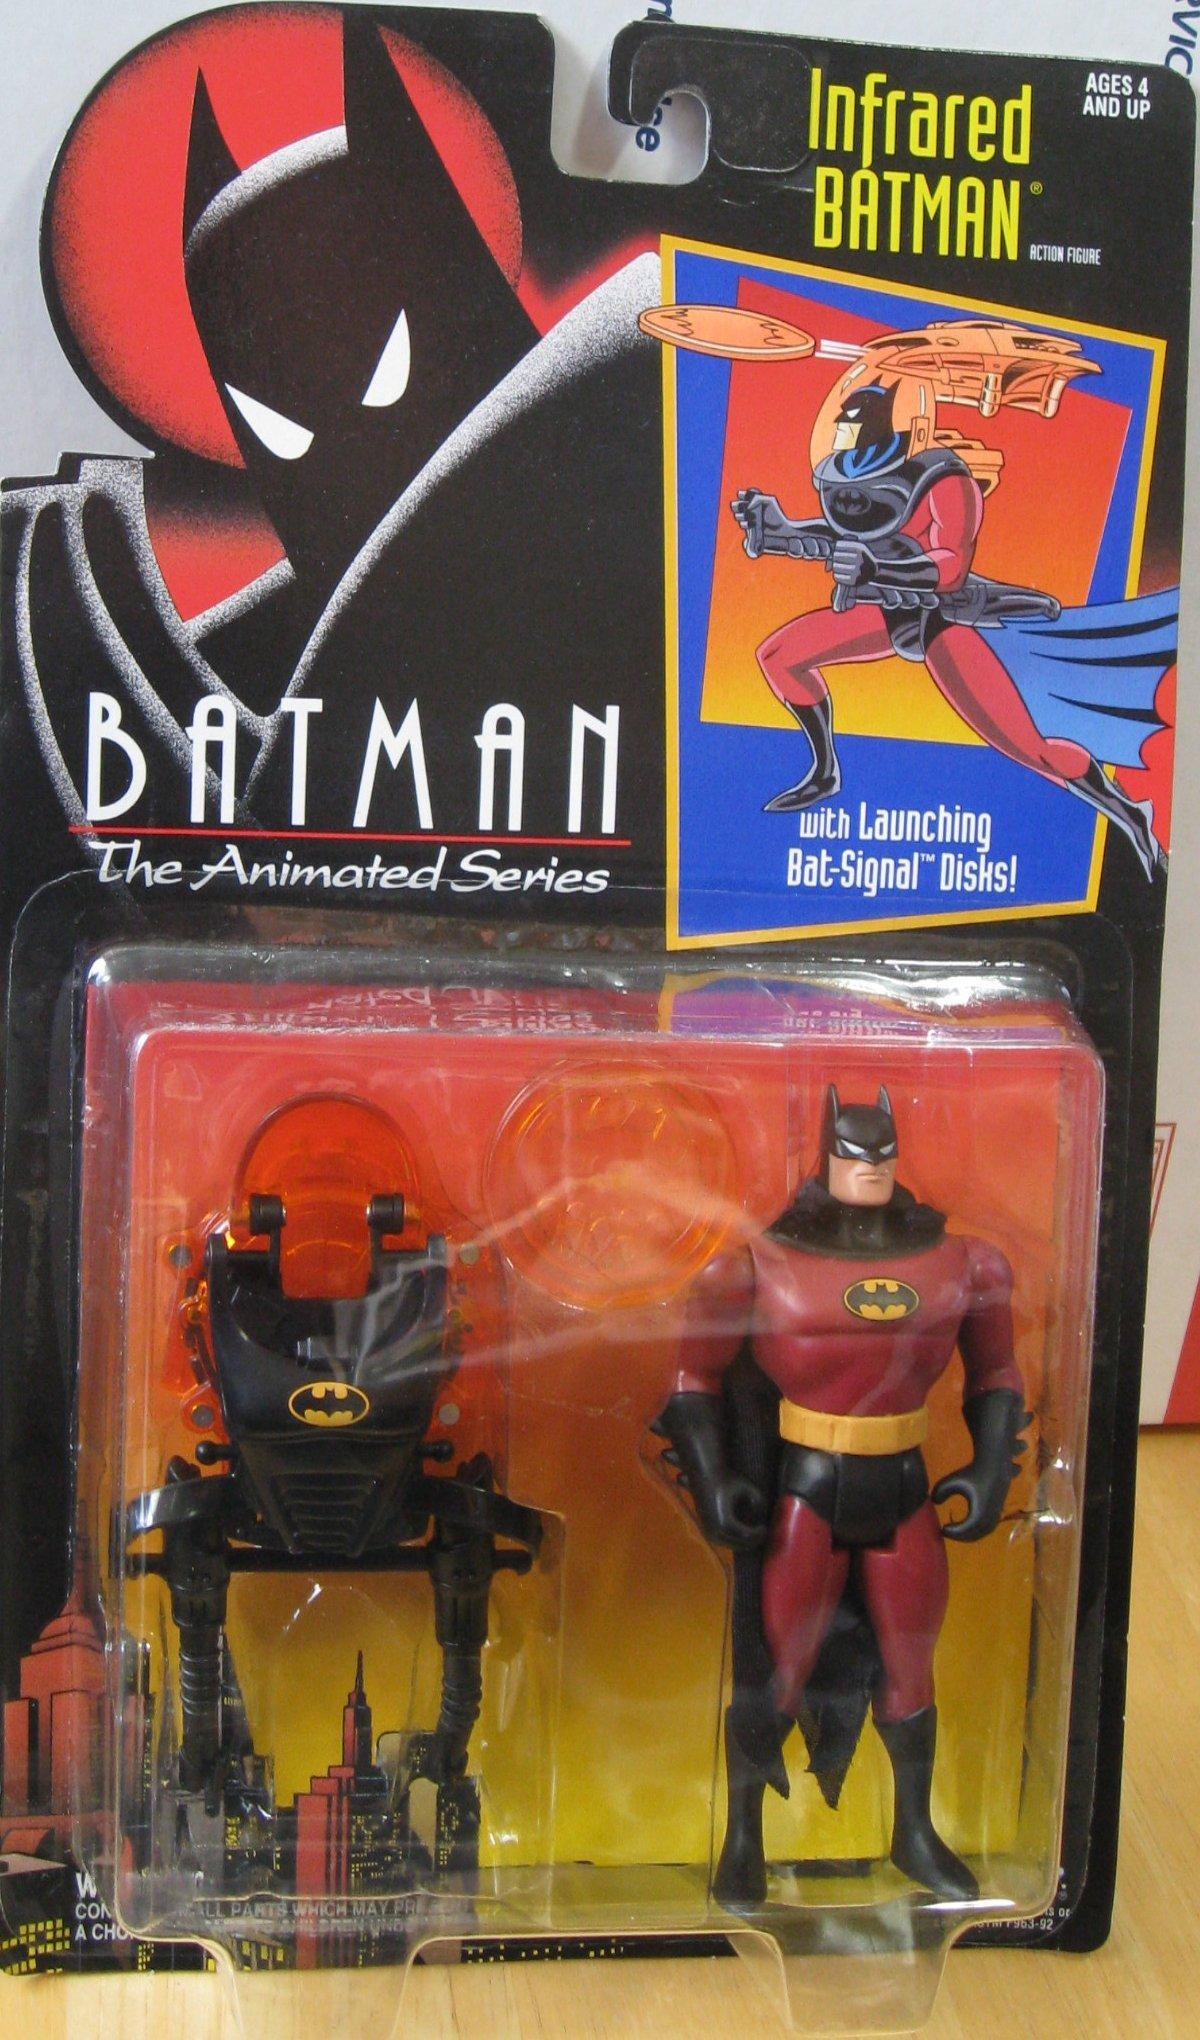 Batman Bin Batman Animated Series Infrared Batman on Killer Croc Action Figure